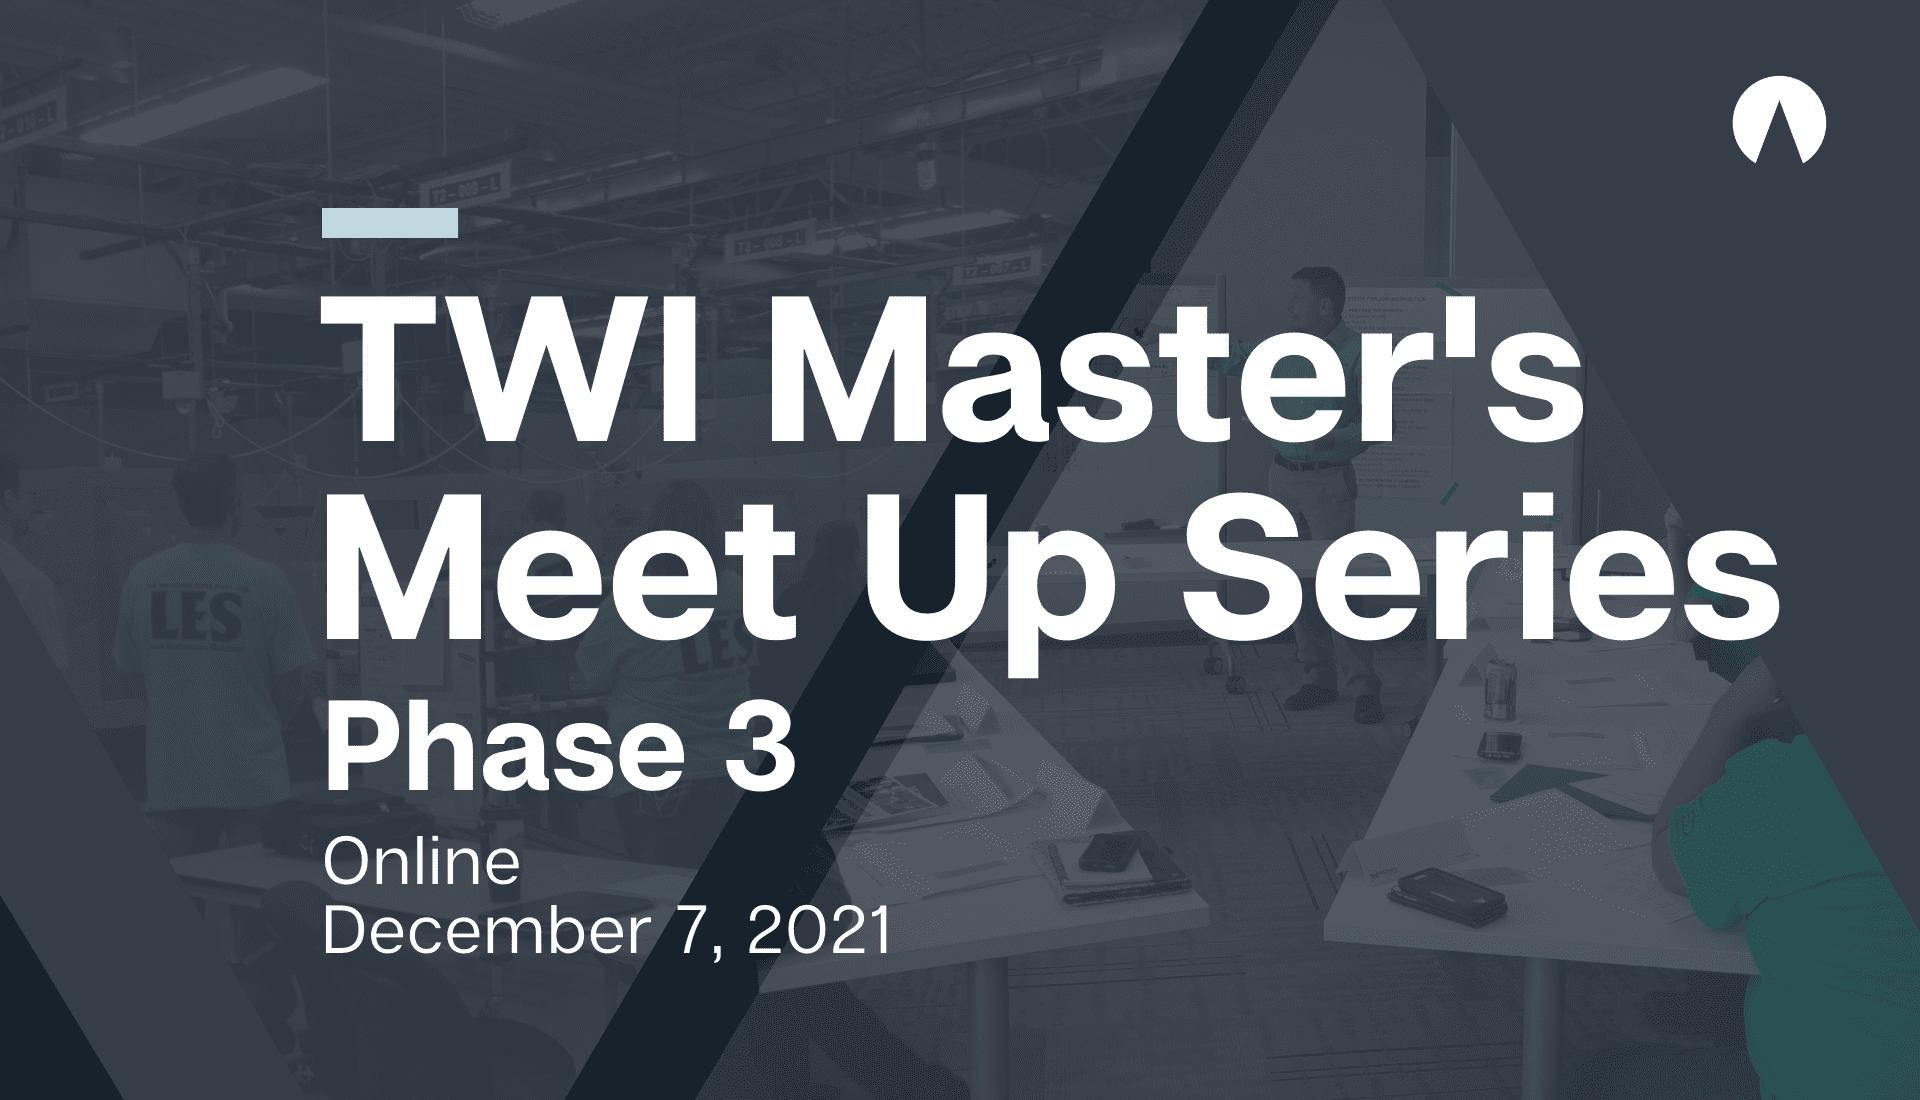 TWI Master's Meet Up: Phase 3